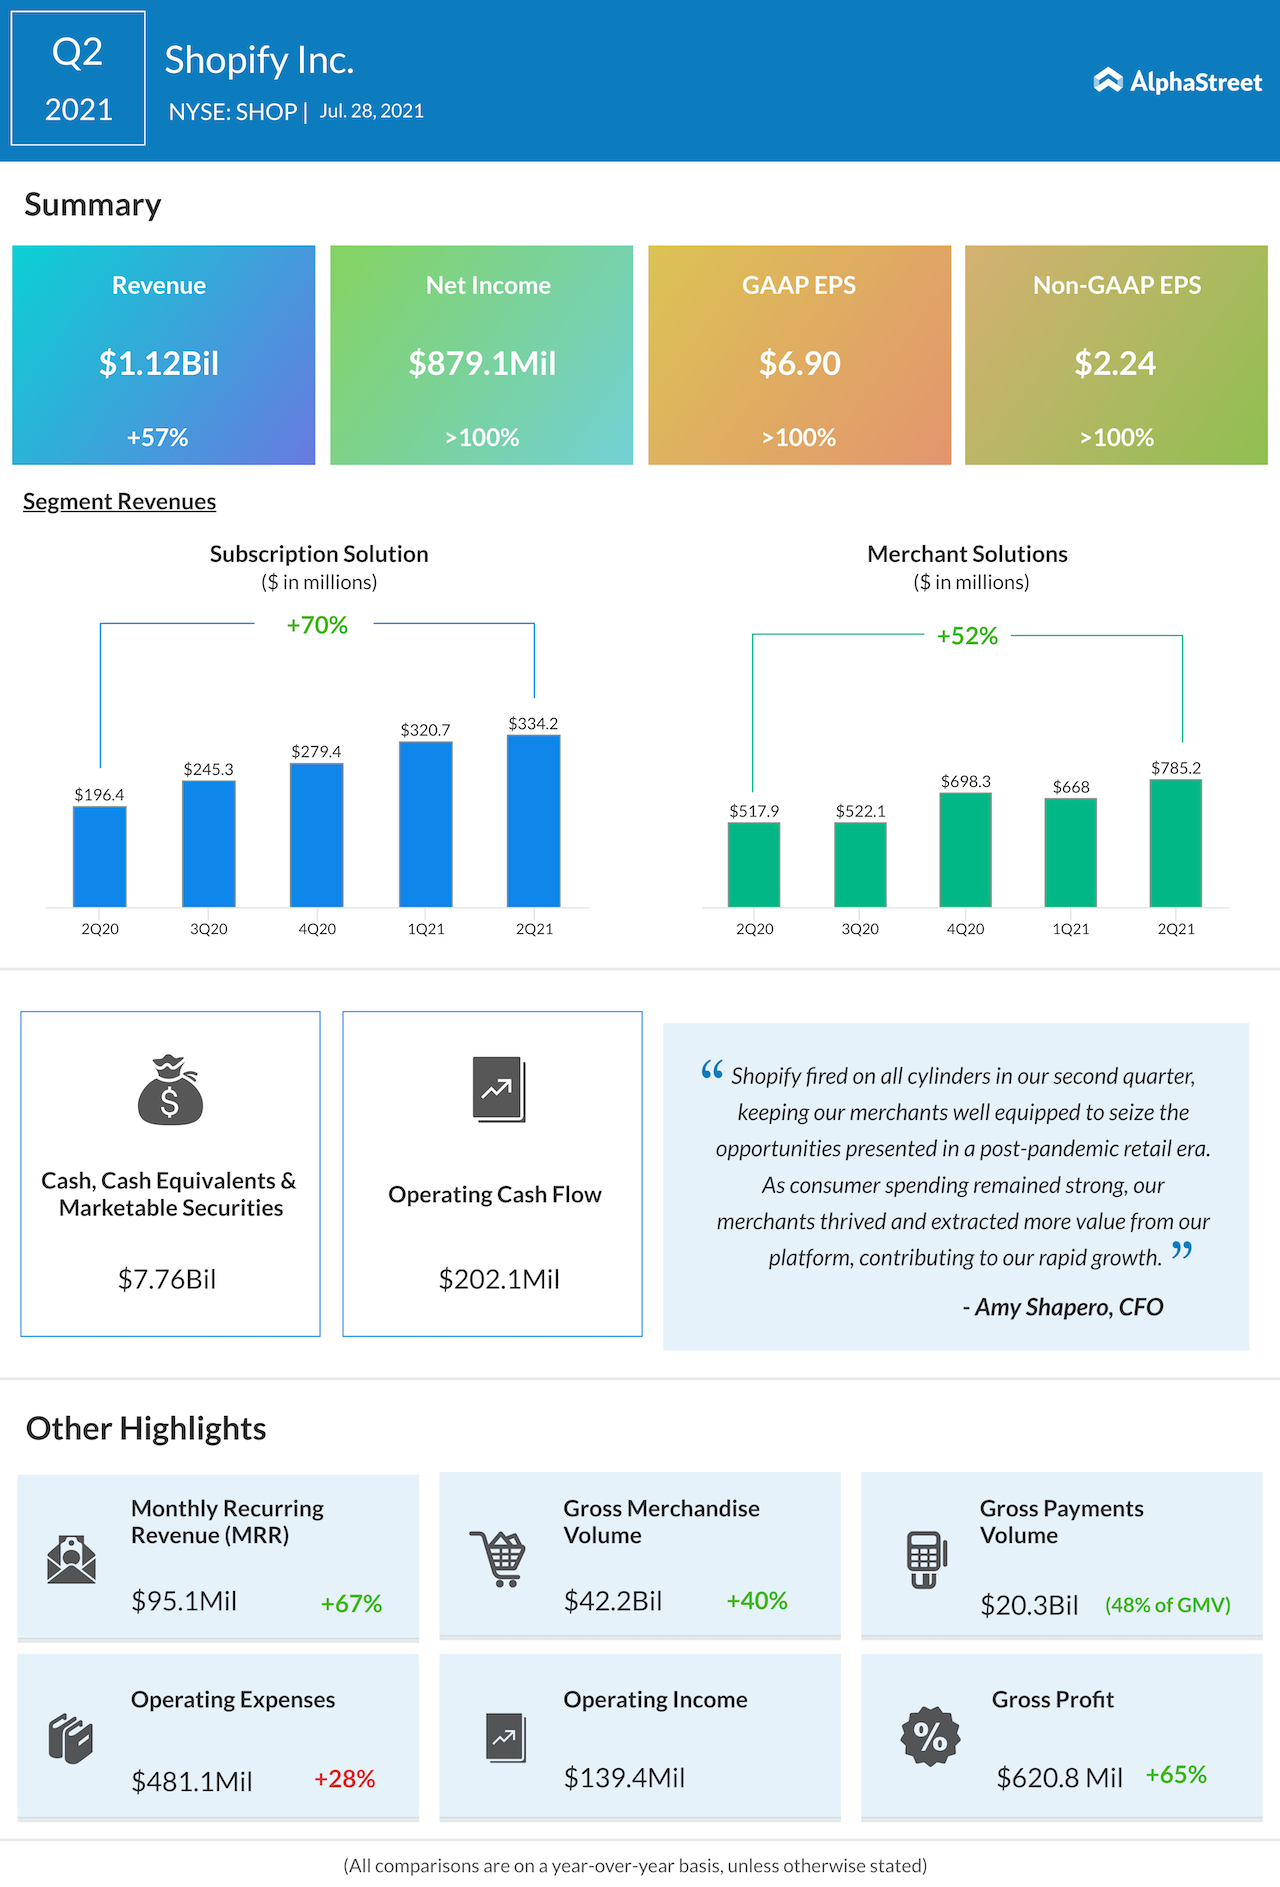 Shopify Inc Q2 2021 earnings